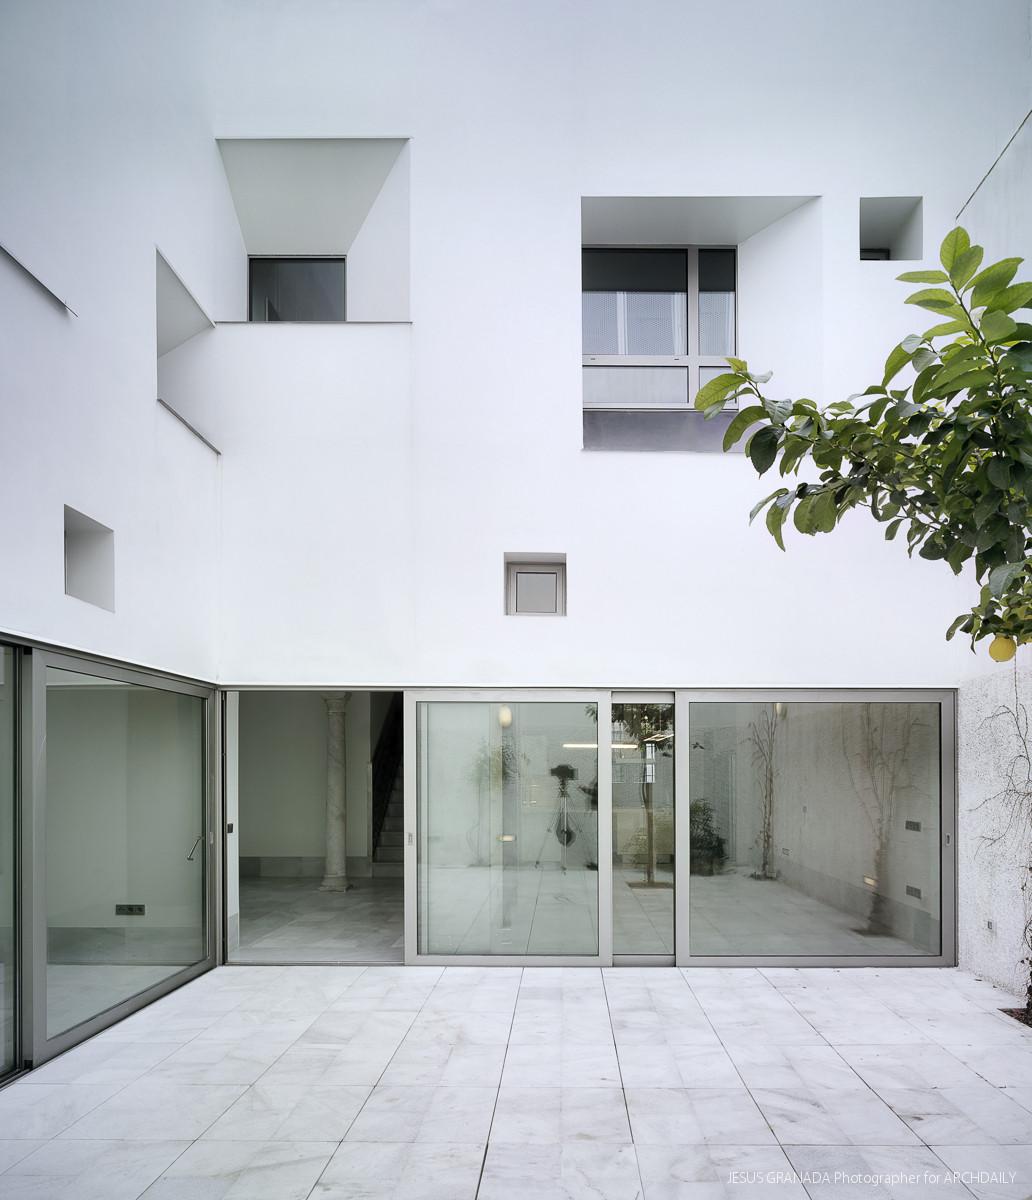 Galeria de casa malpartida sv60 arquitectos 1 for Arquitectos para casas